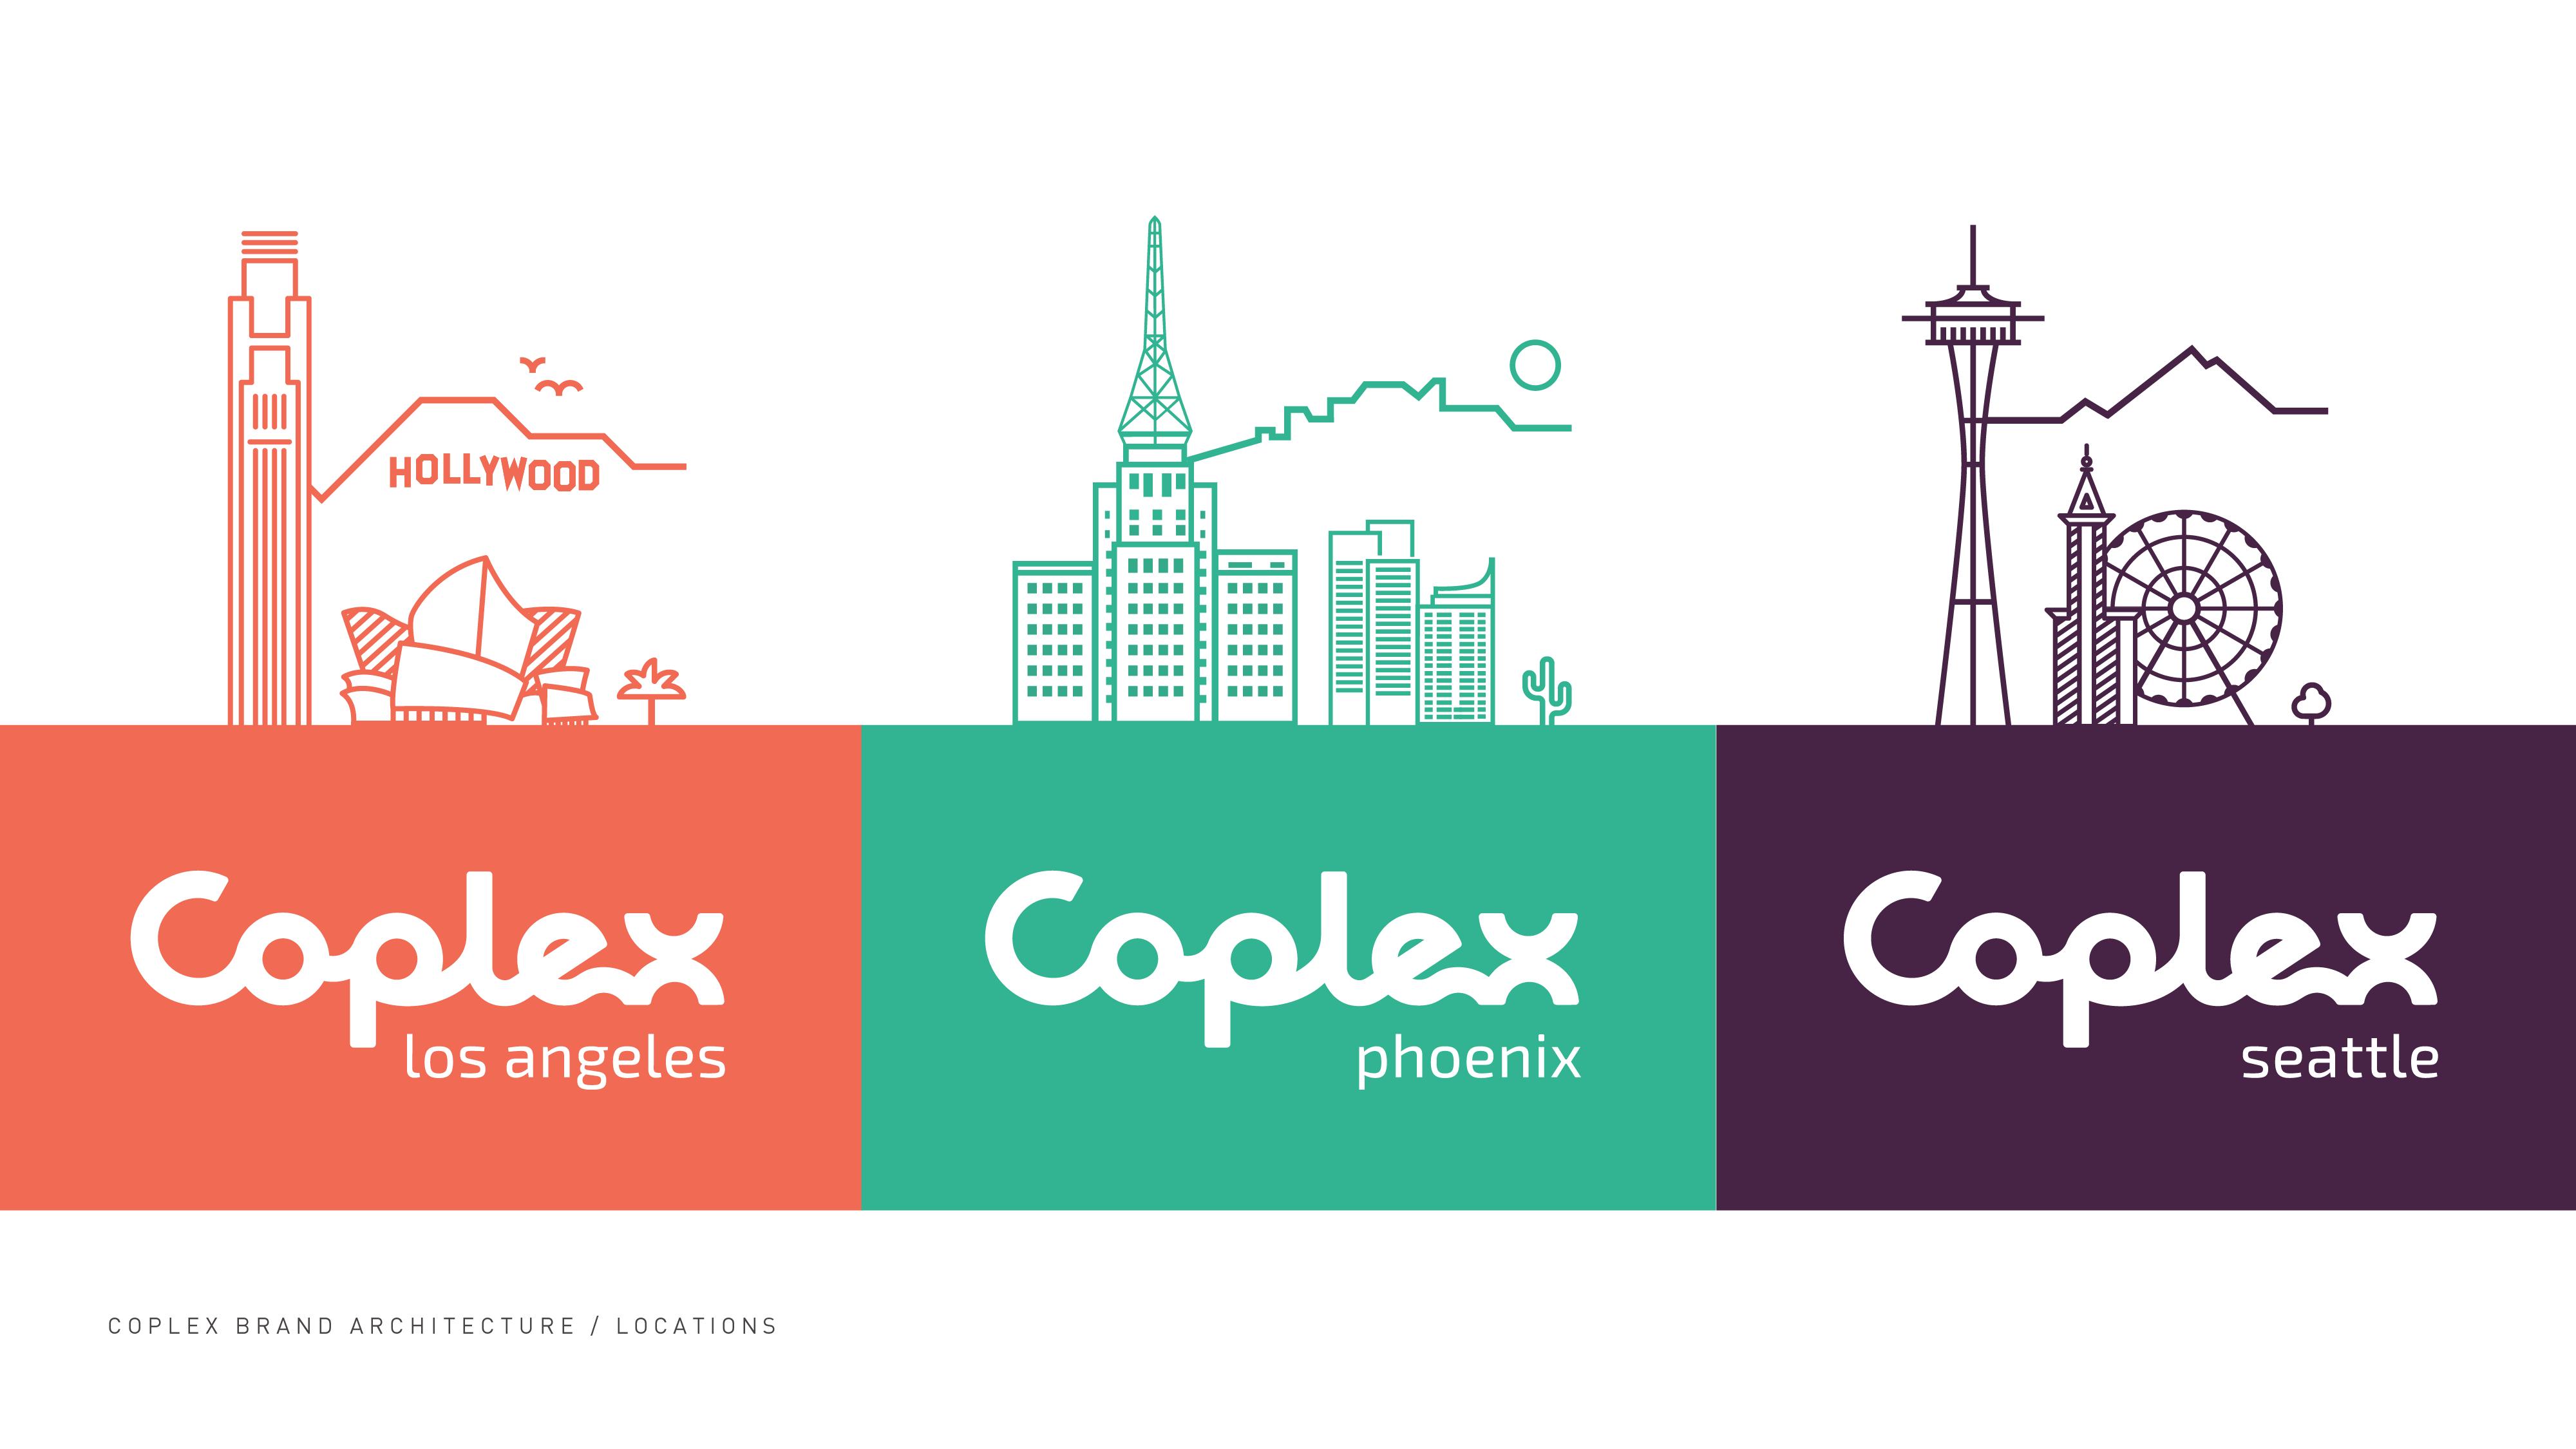 Coplex brand guide v5 locations